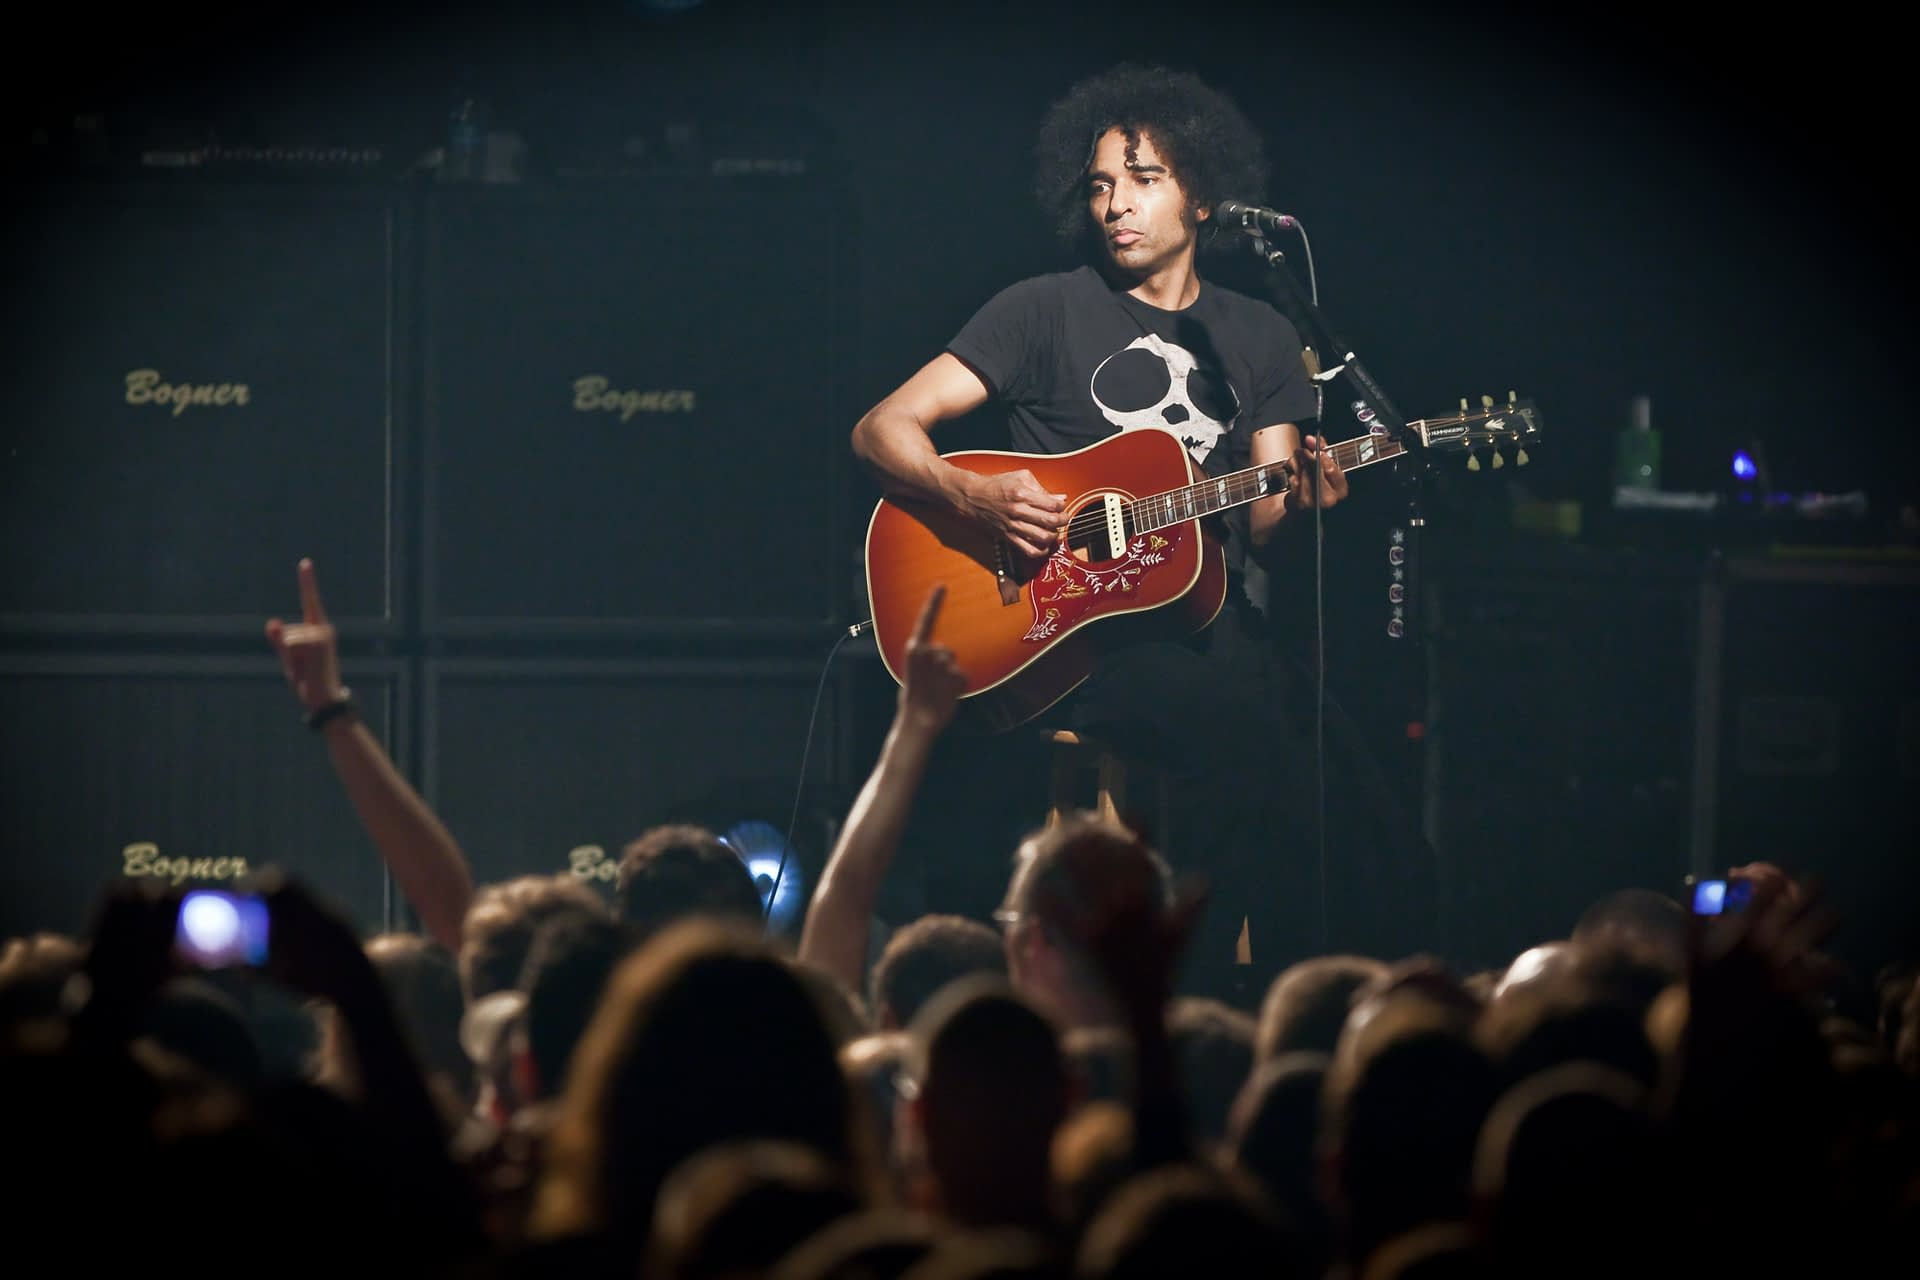 Alice in Chains @ Fri-Son, Fribourg, Switzerland, 03.12.2009